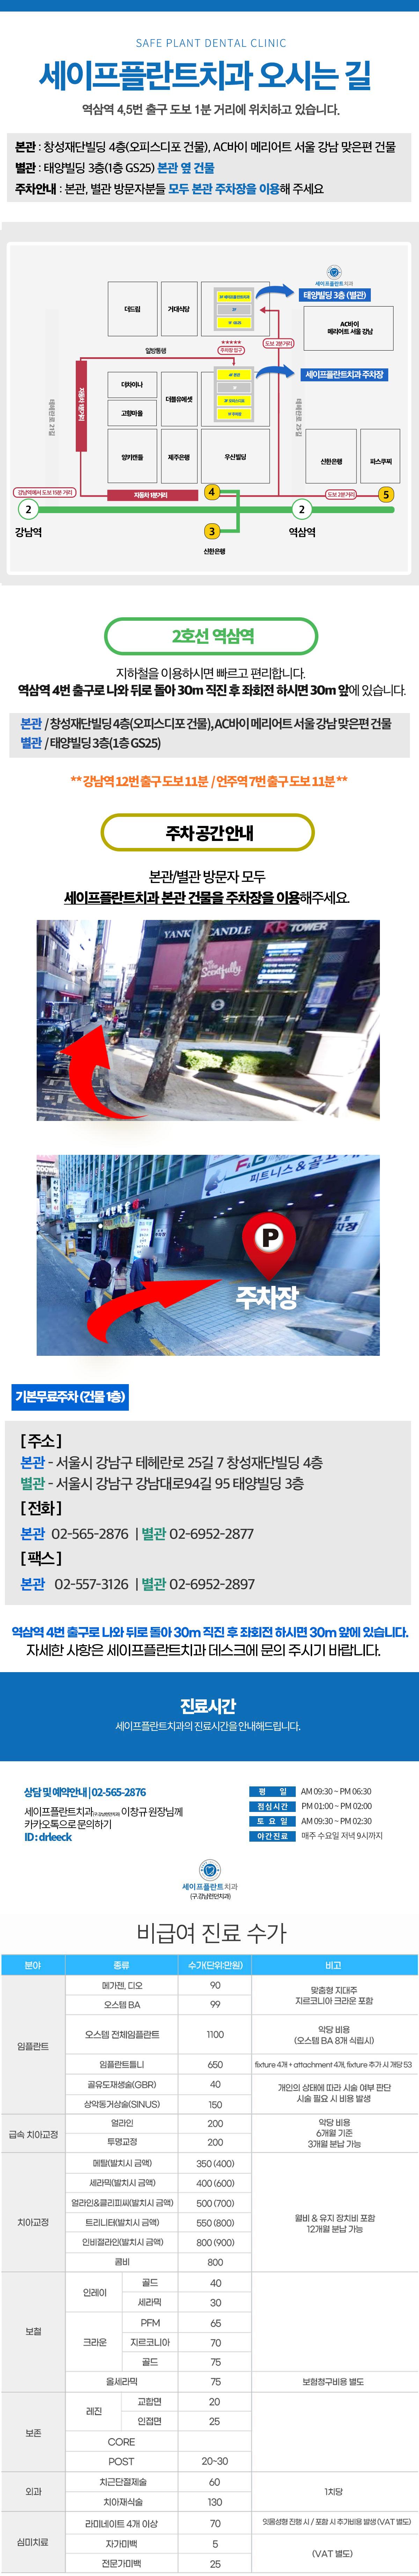 new_info.jpg